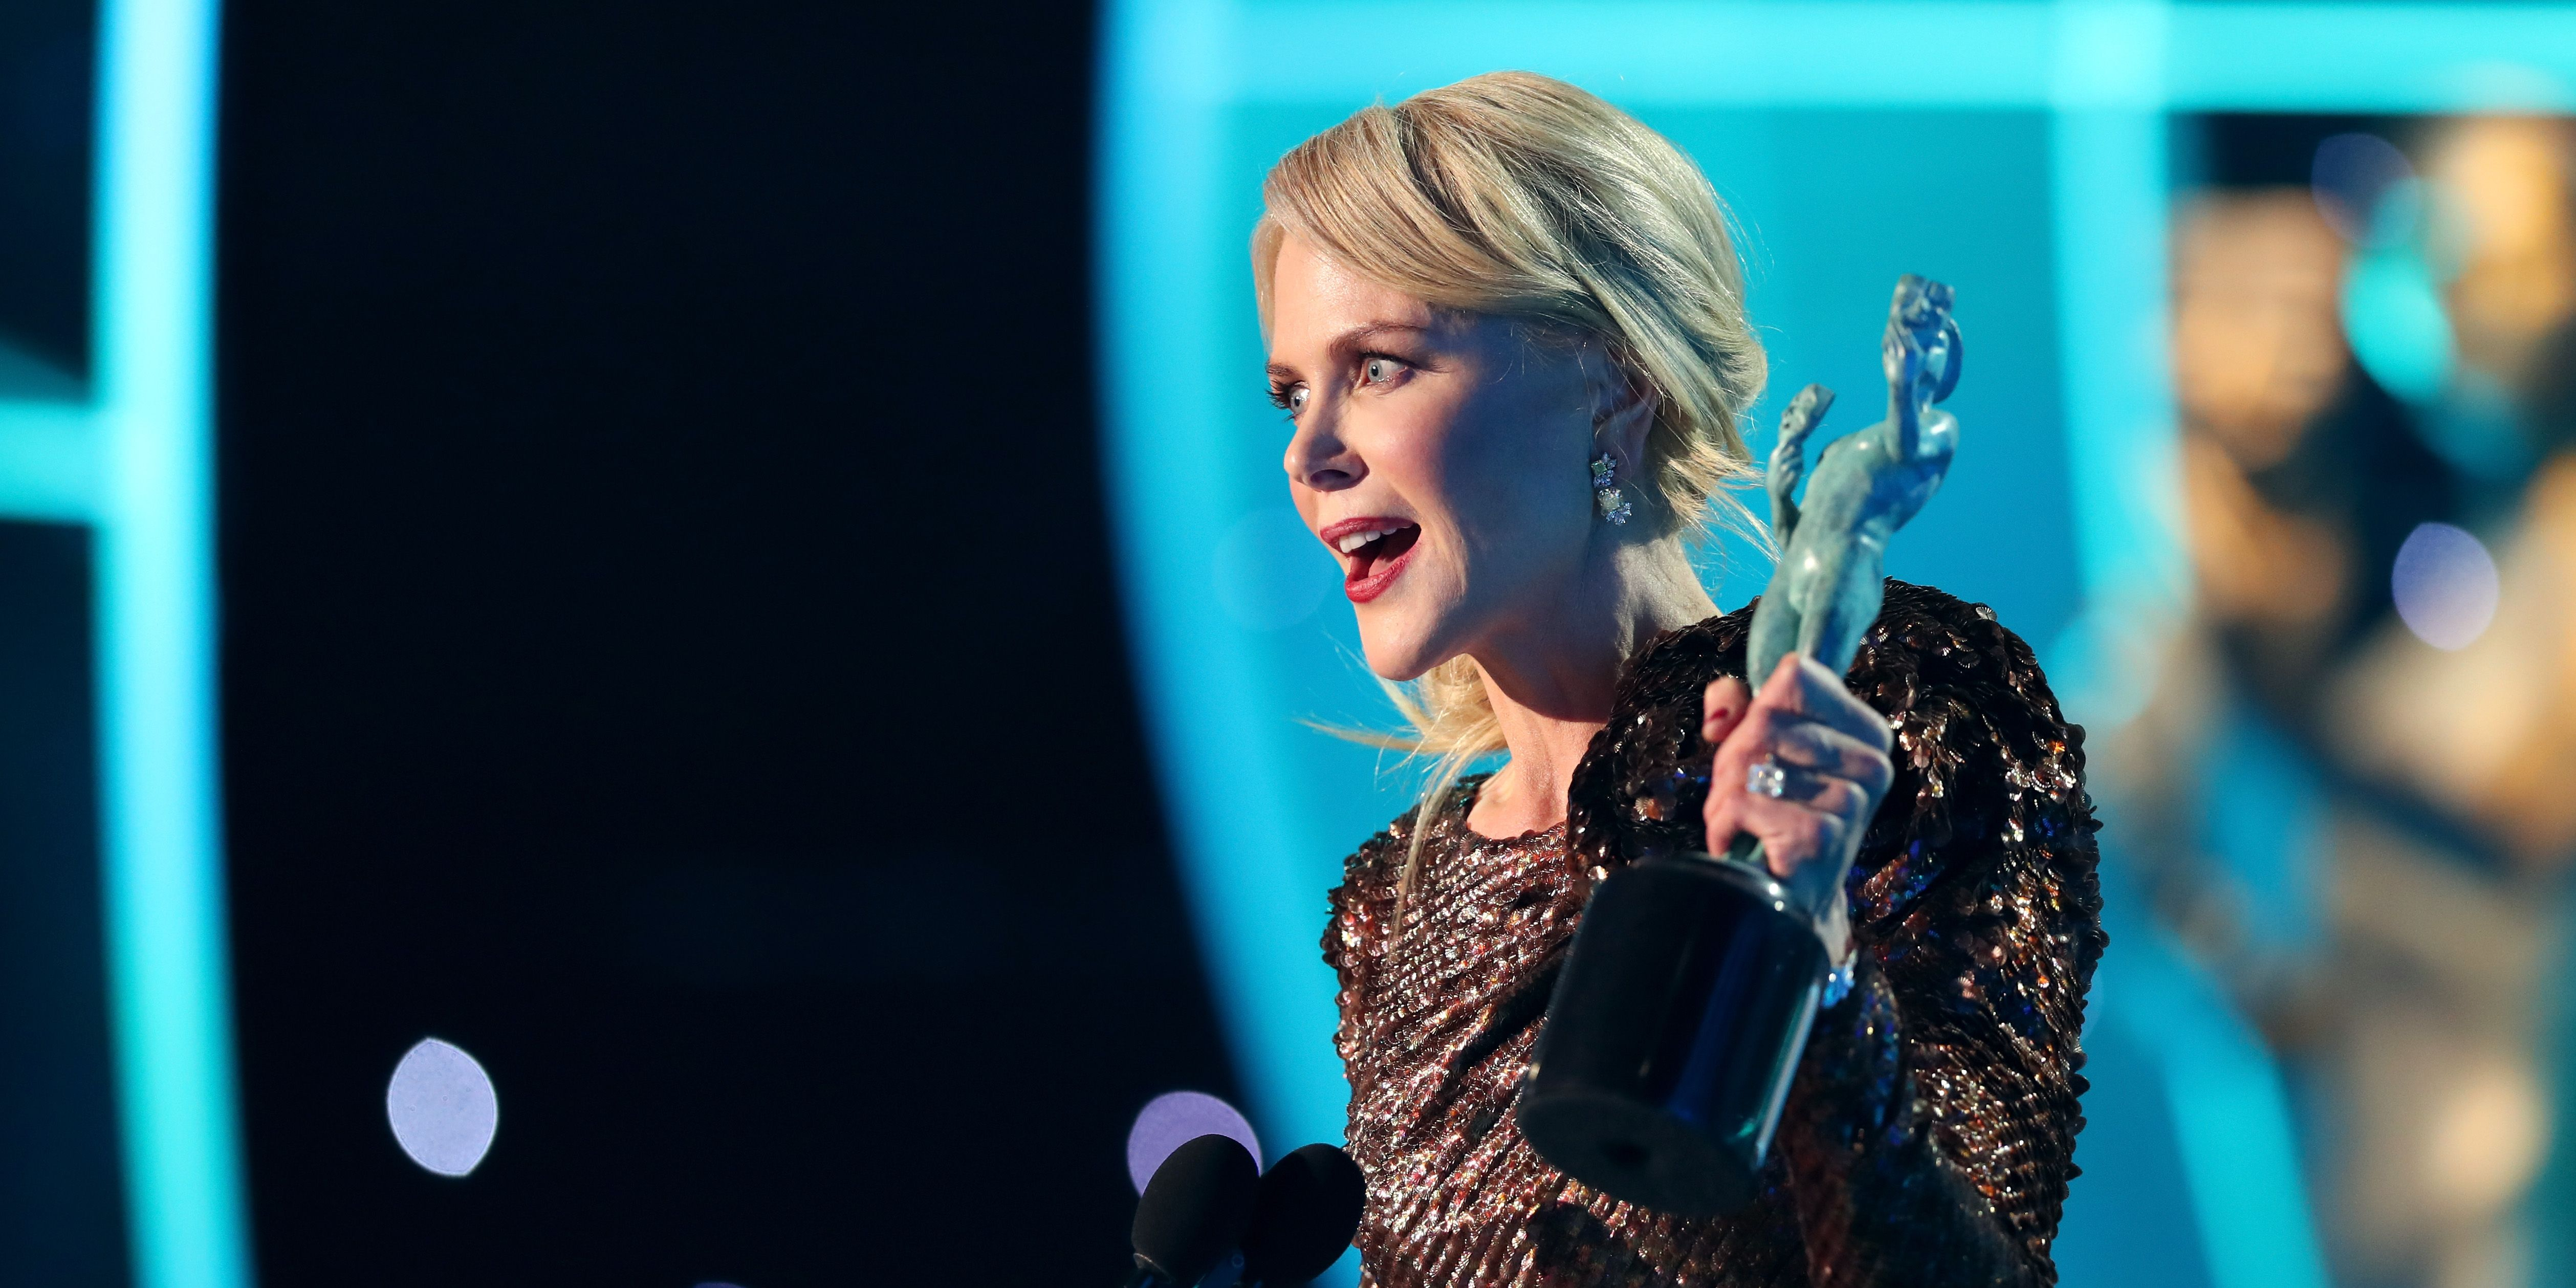 Nicole Kidman speech at the SAG Awards 2018